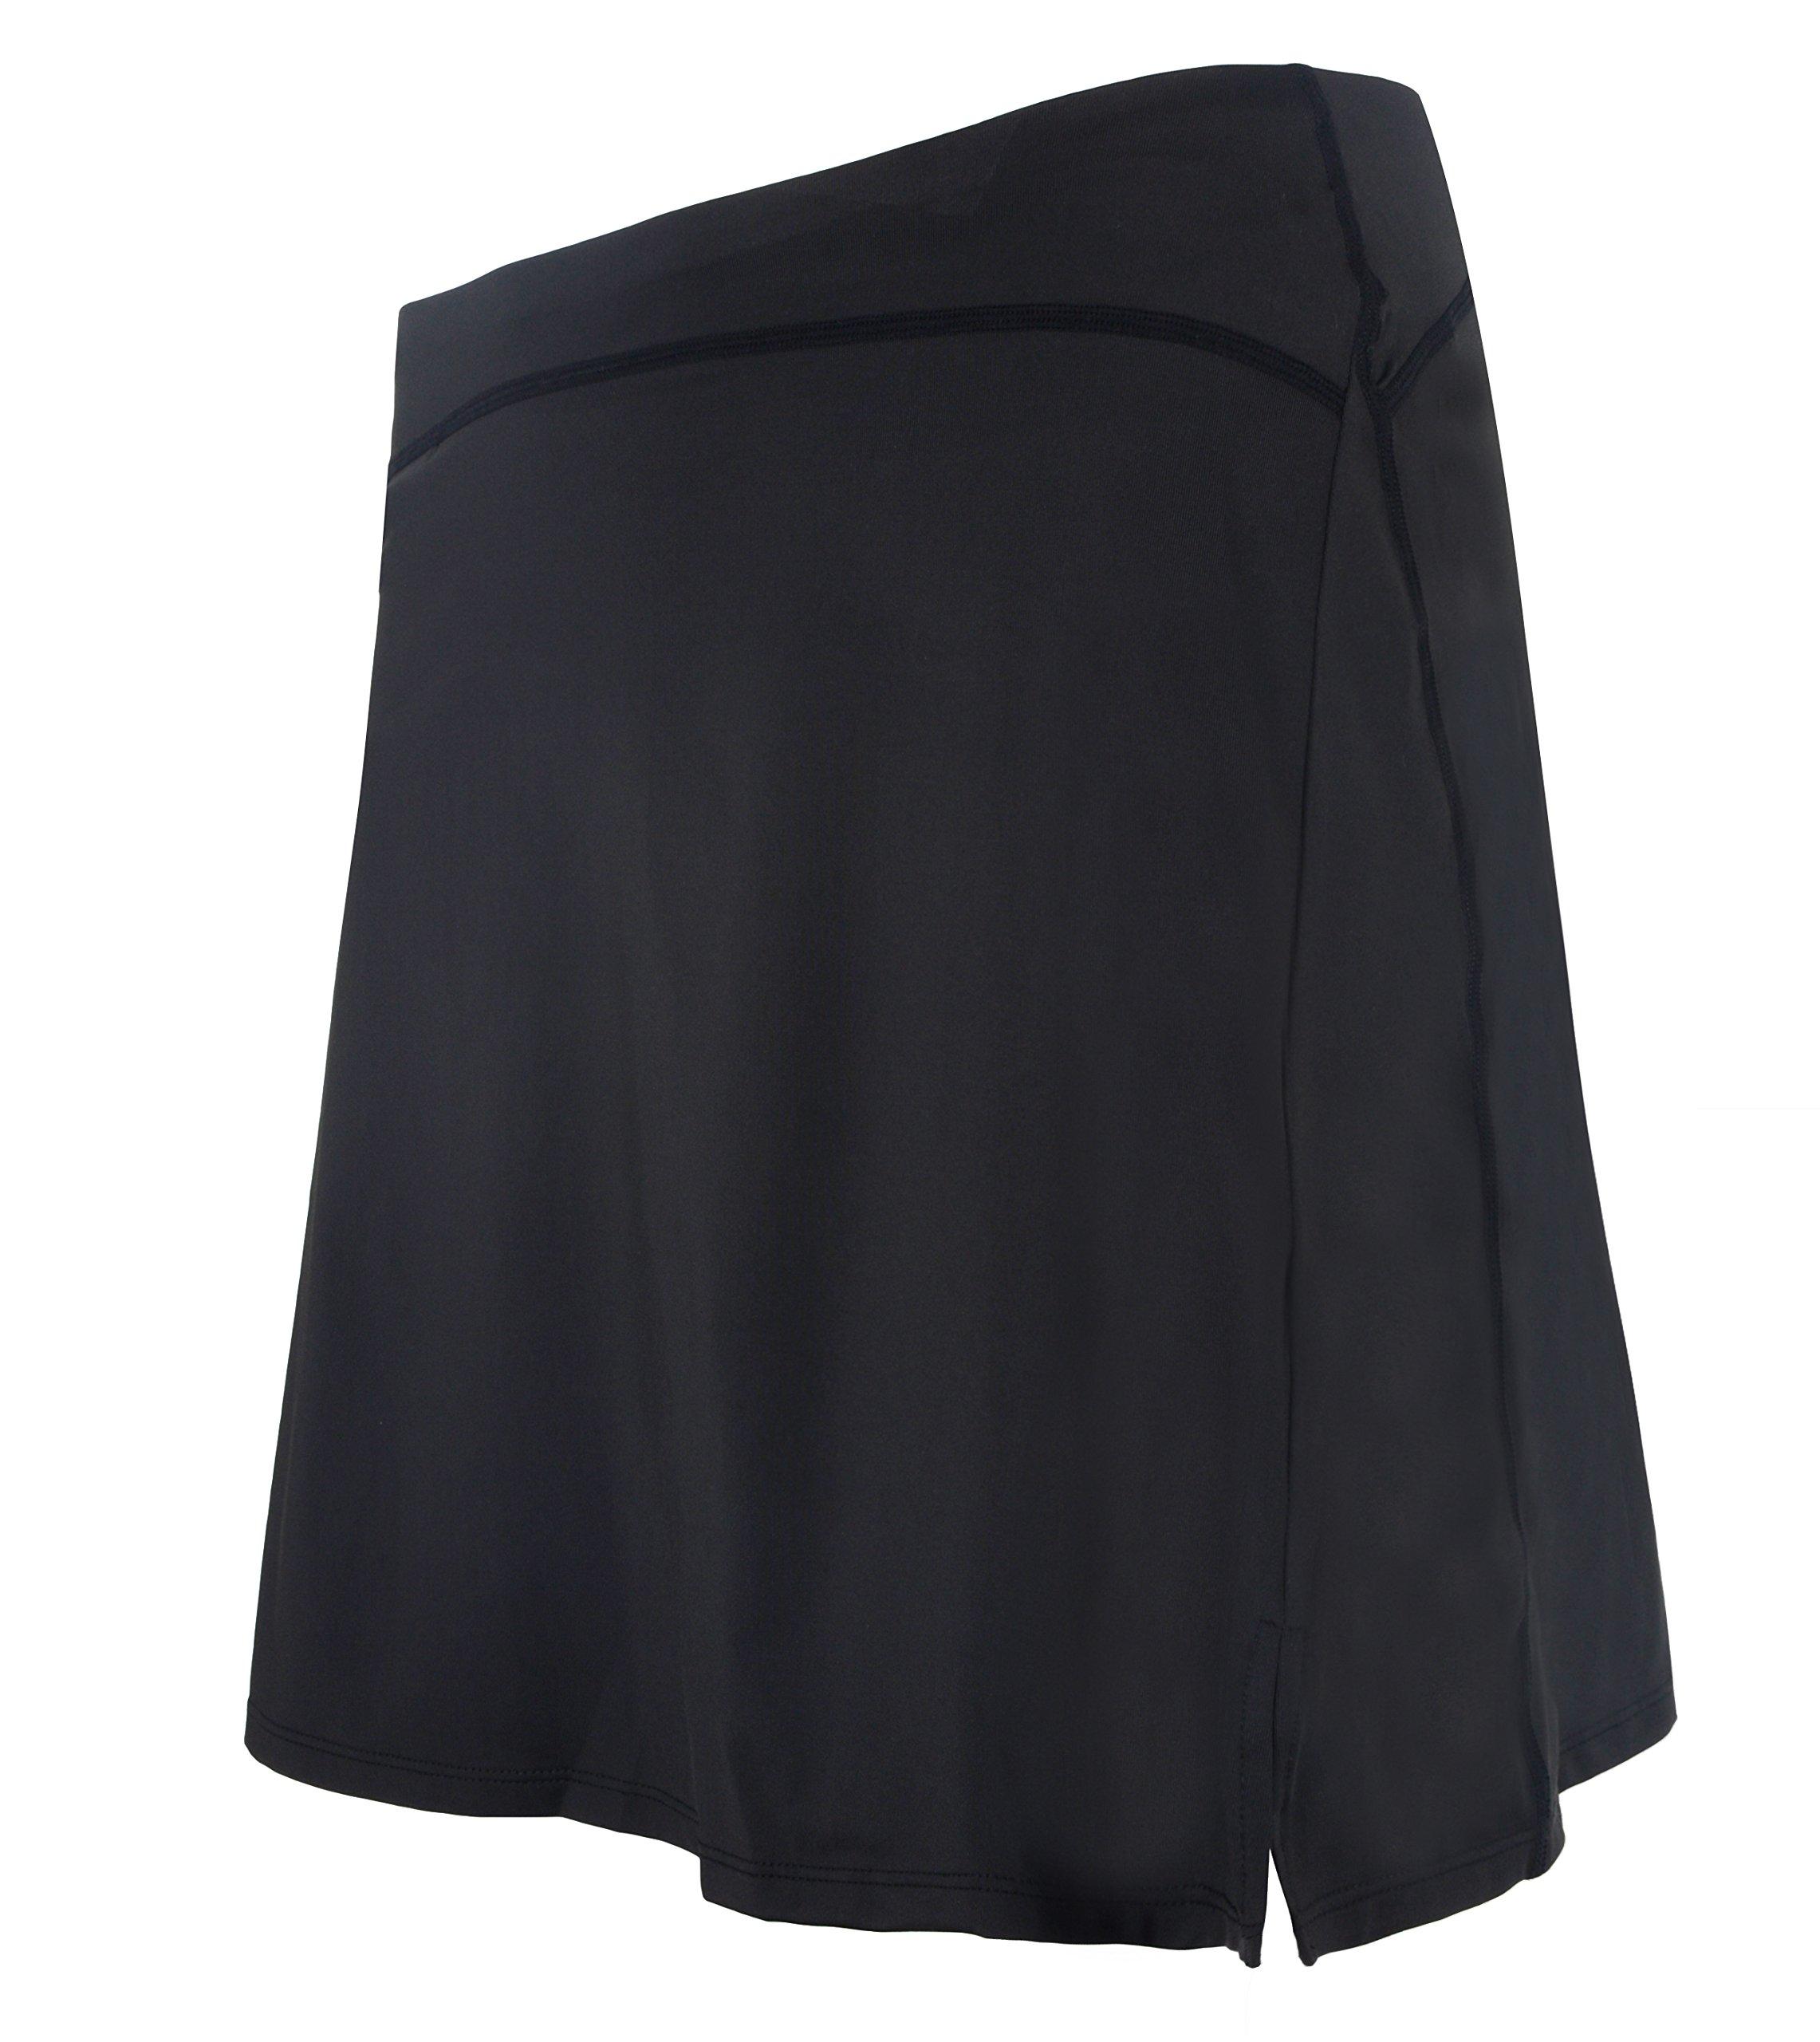 slimour Women Modest Running Skirt Travel Skirts with Pocket Swim Skirt High Waist with Shorts Black M by slimour